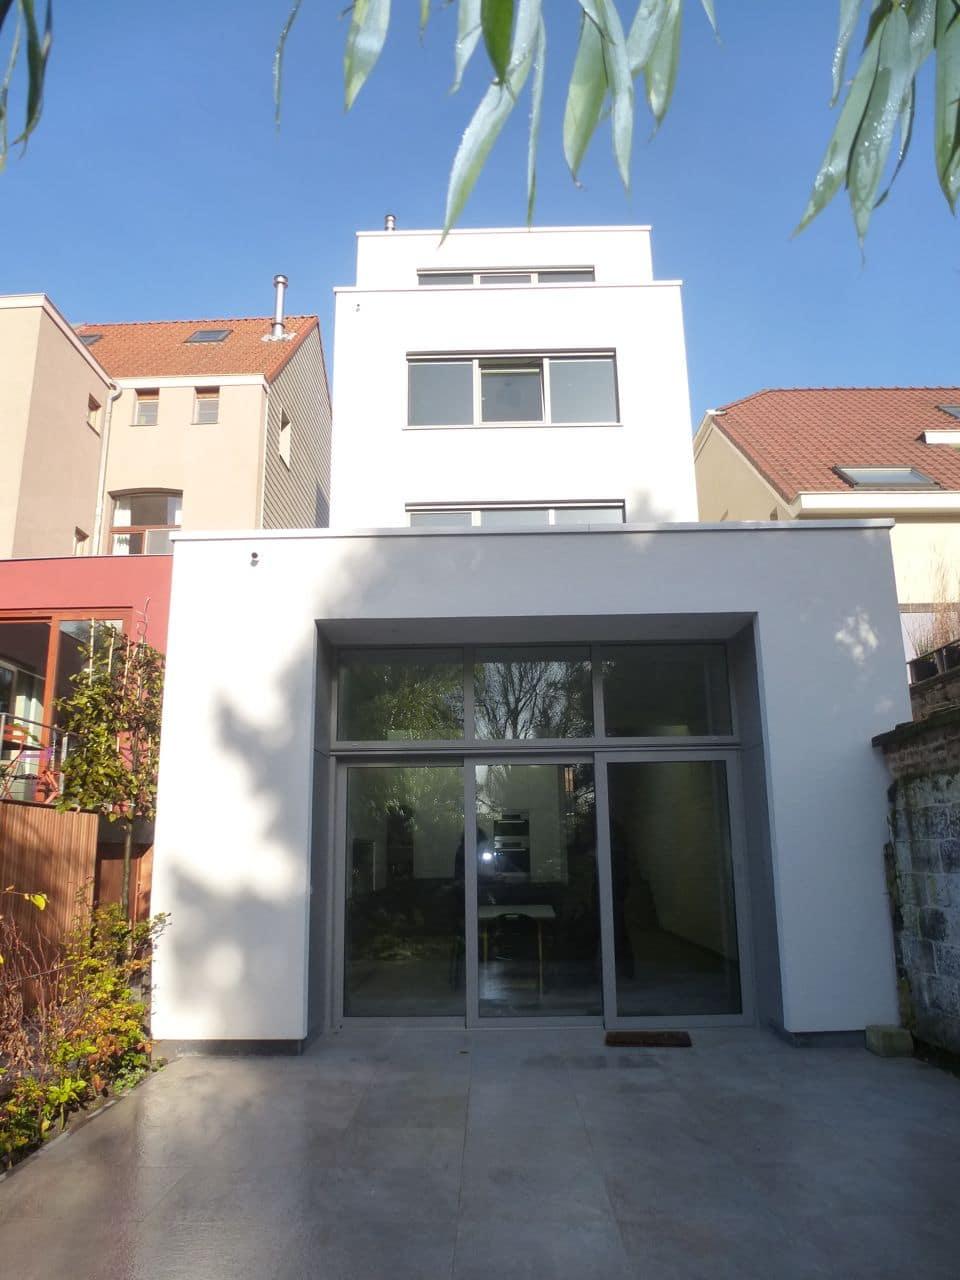 P1080592 | Baeyens & Beck architecten Gent | architect nieuwbouw renovatie interieur | high end | architectenbureau